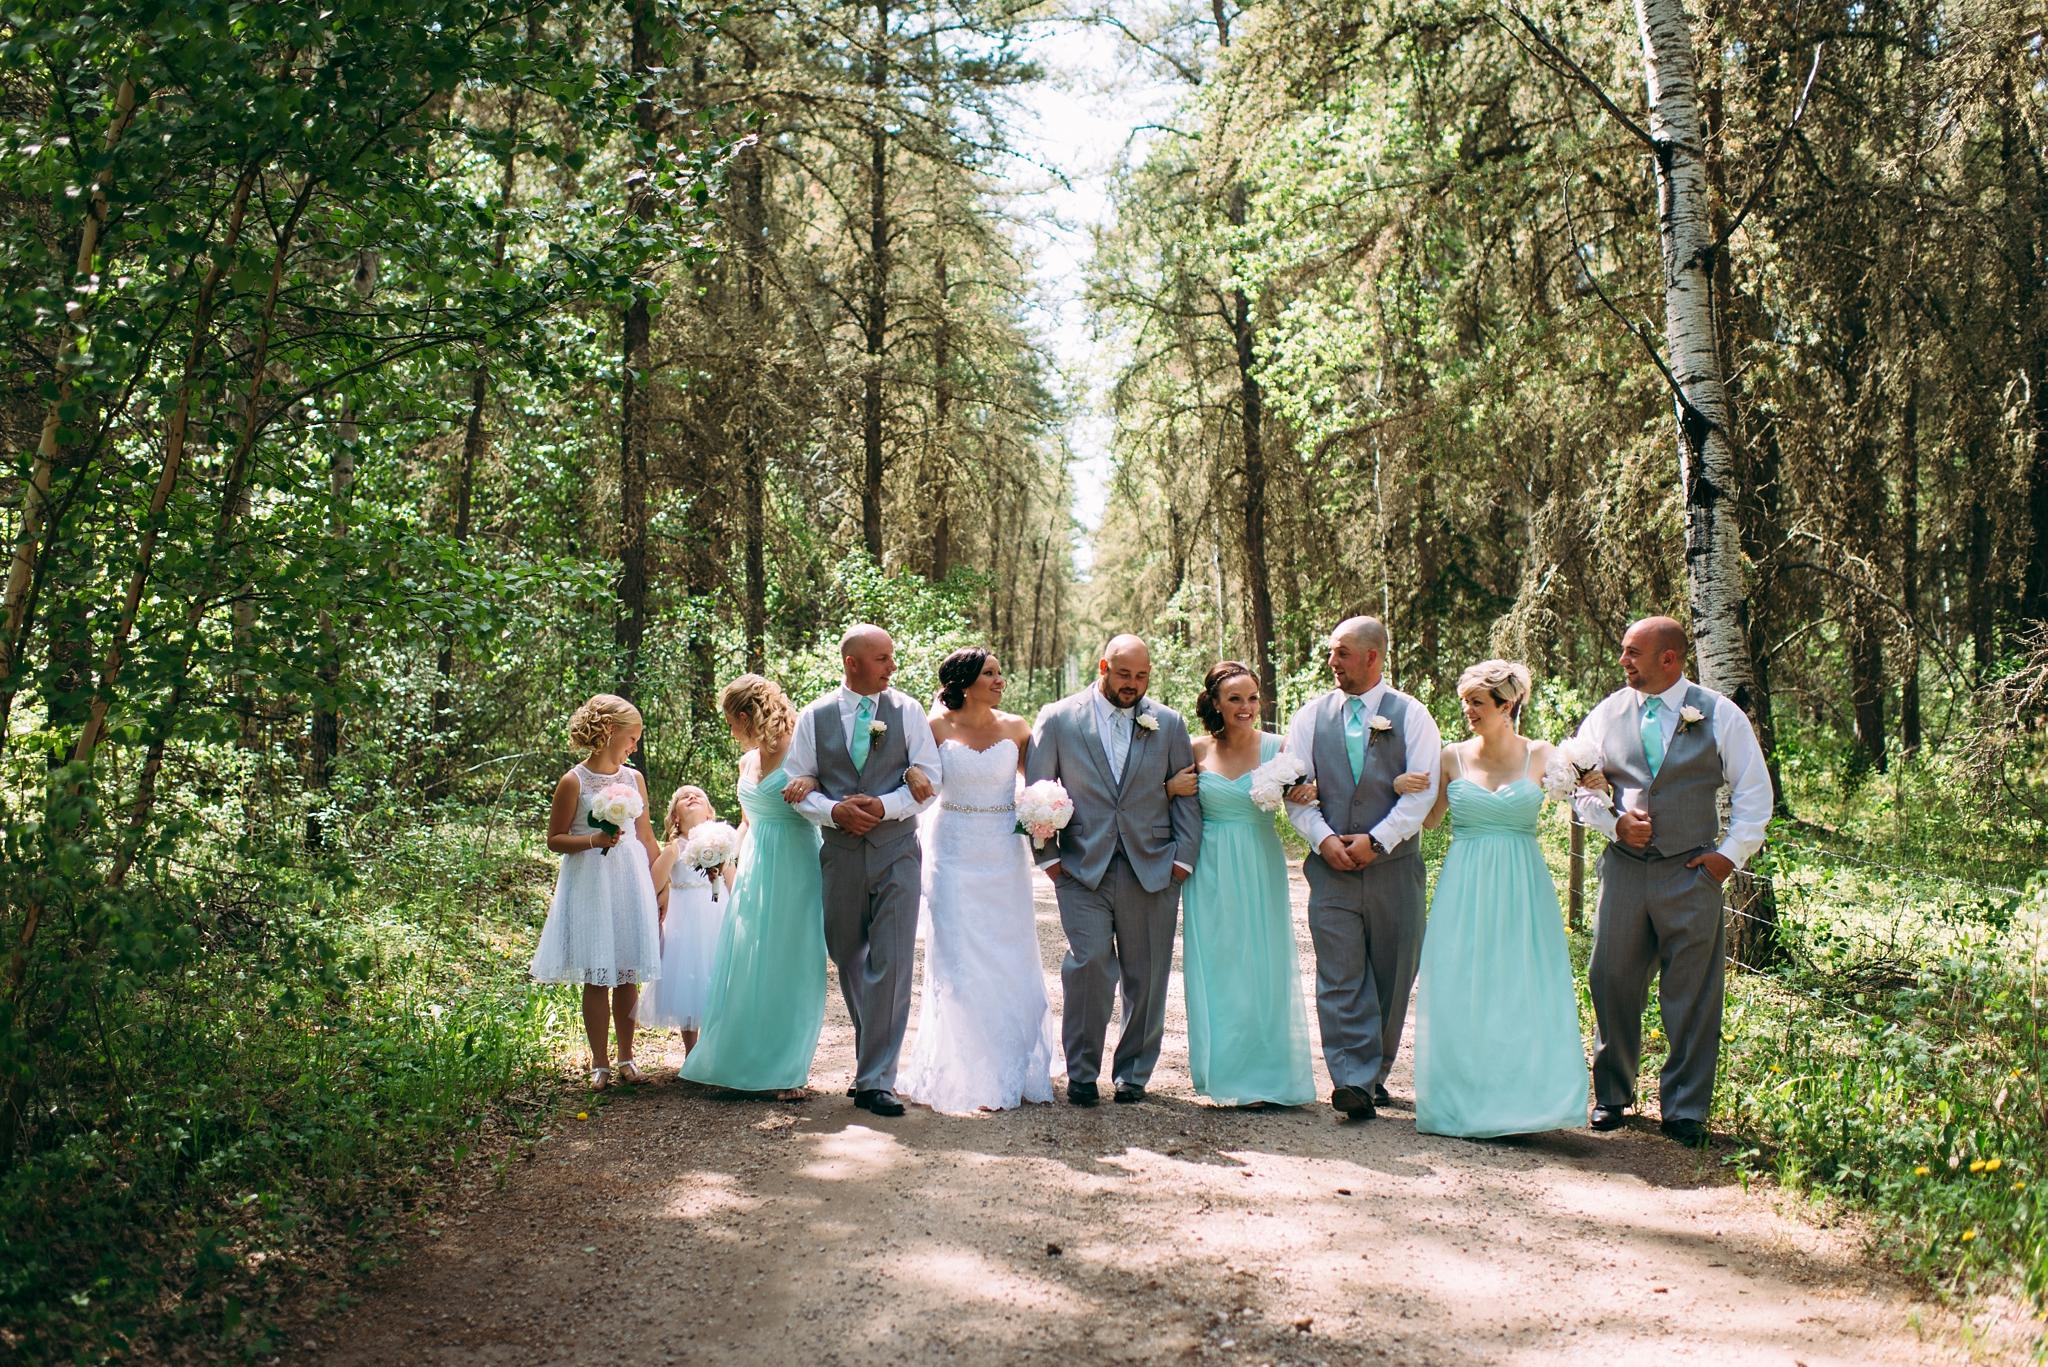 kaihla_tonai_intimate_wedding_elopement_photographer_1530